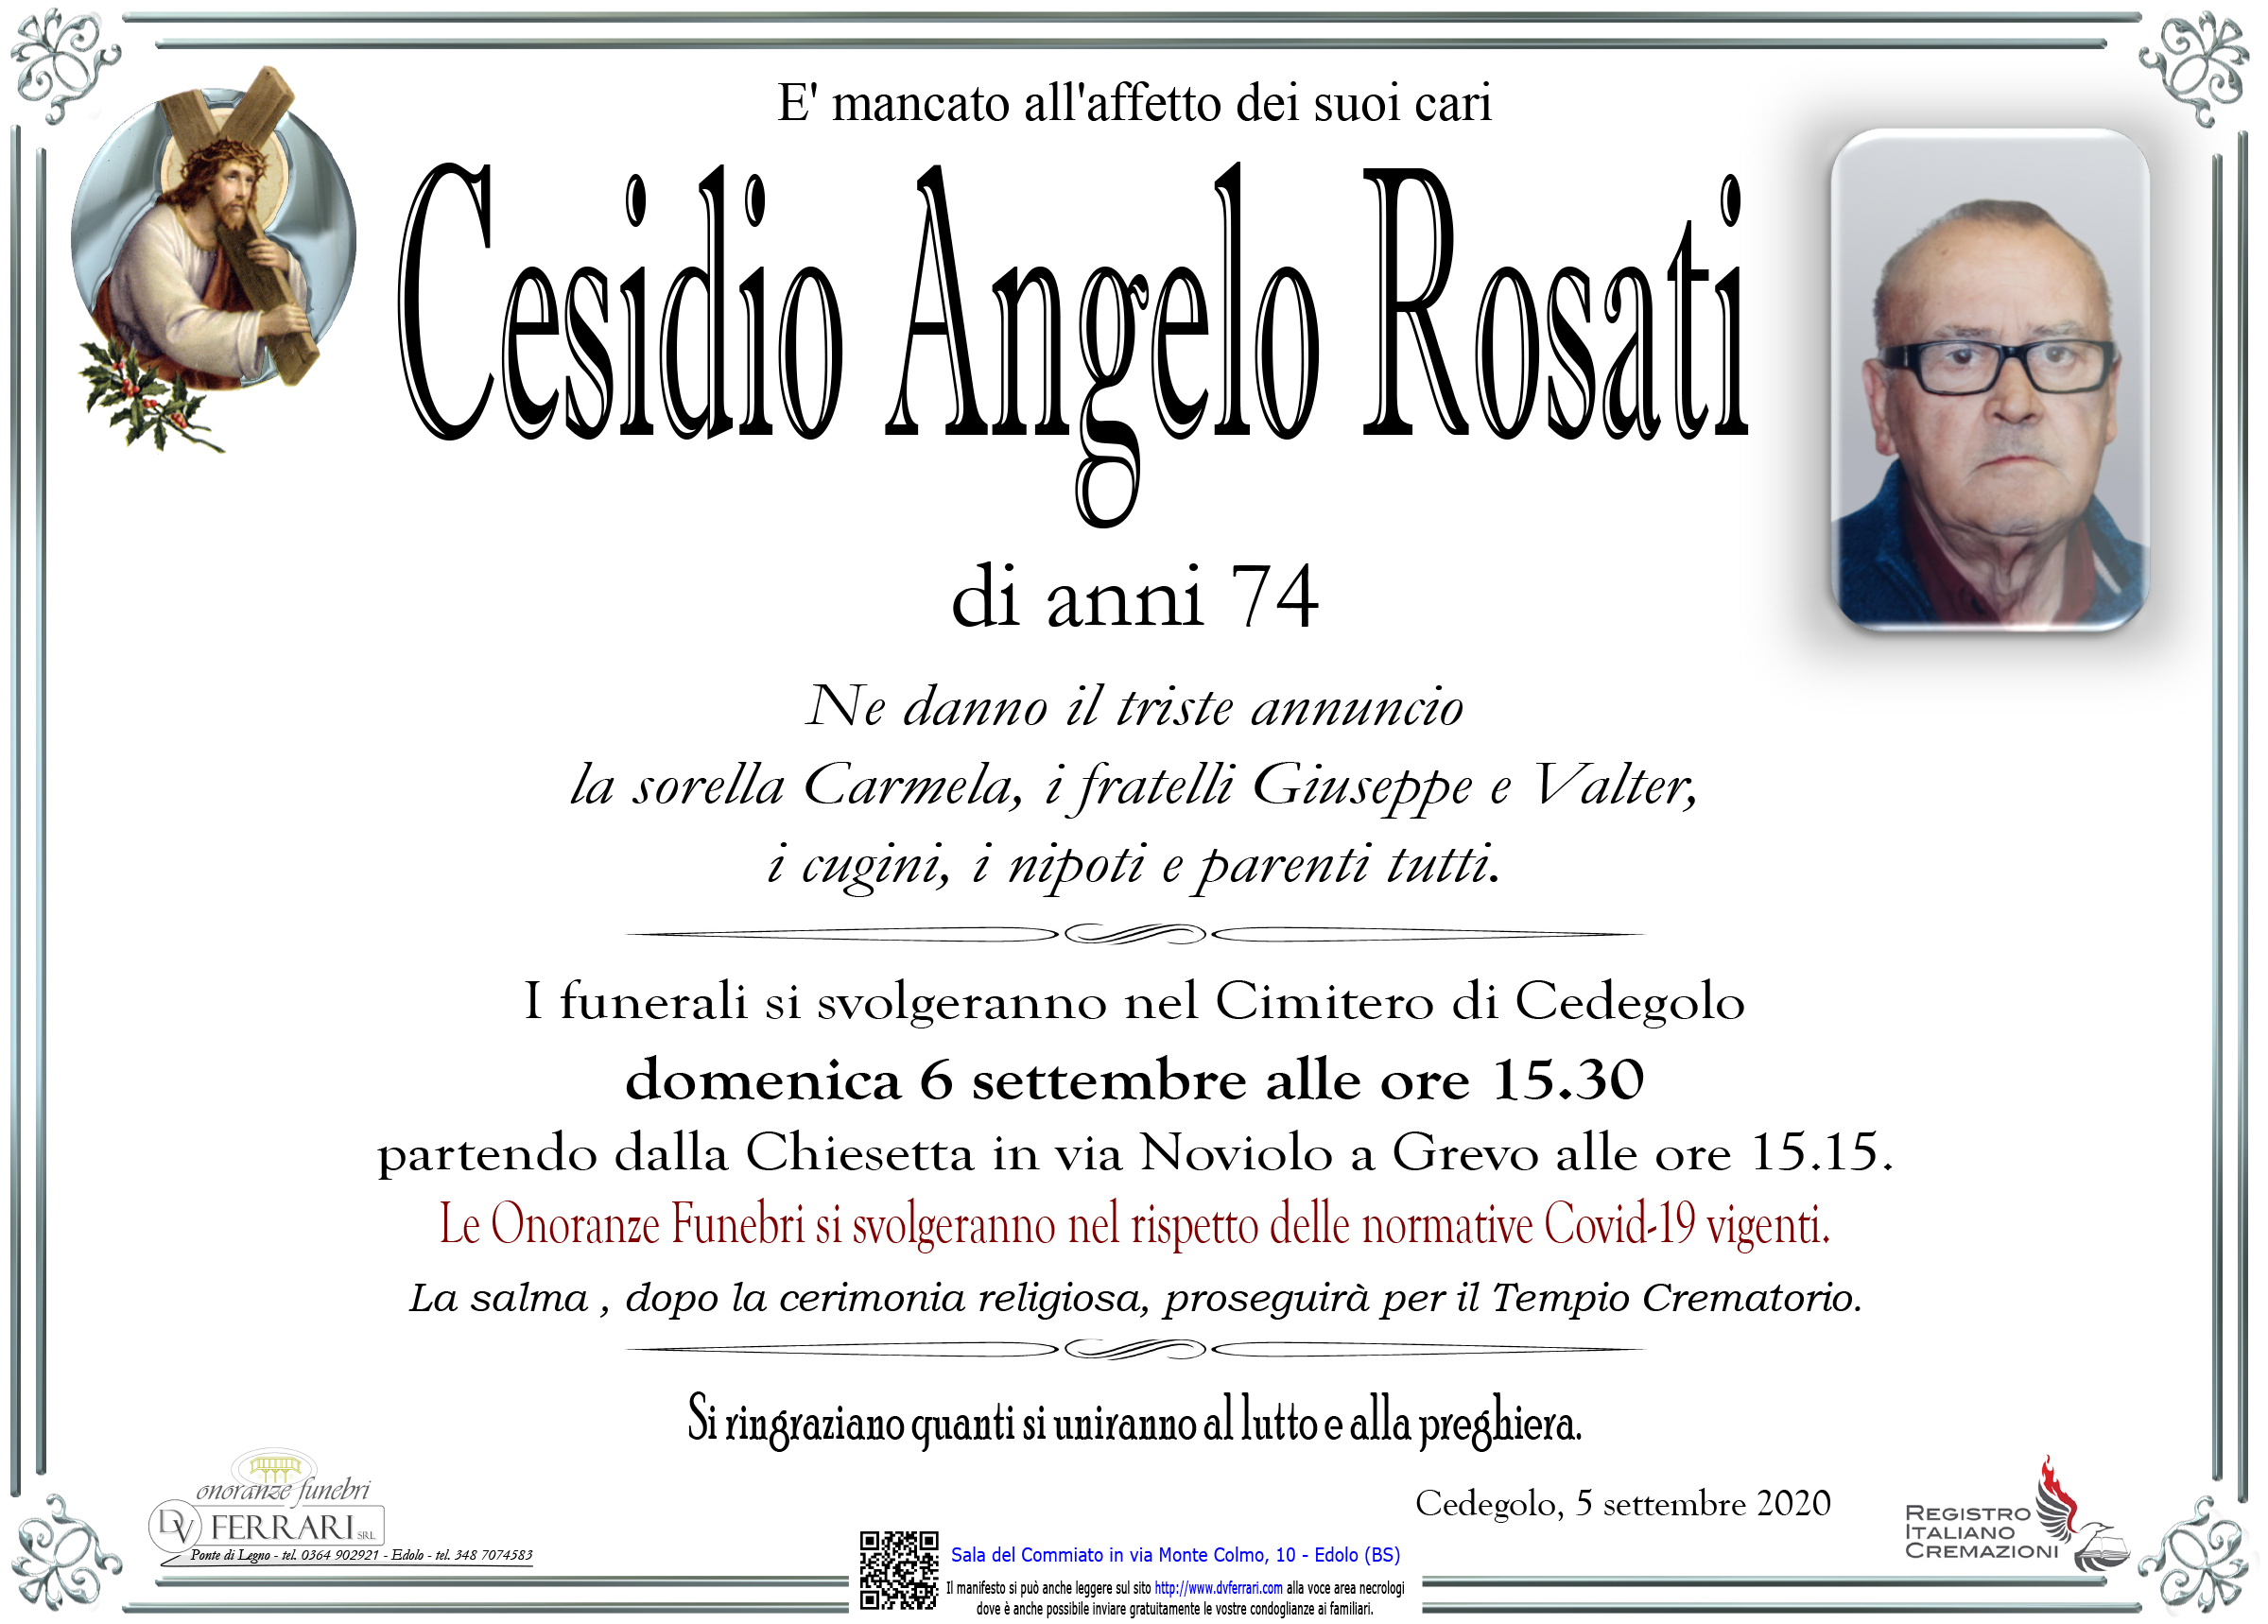 CESIDIO ANGELO ROSATI - CEDEGOLO